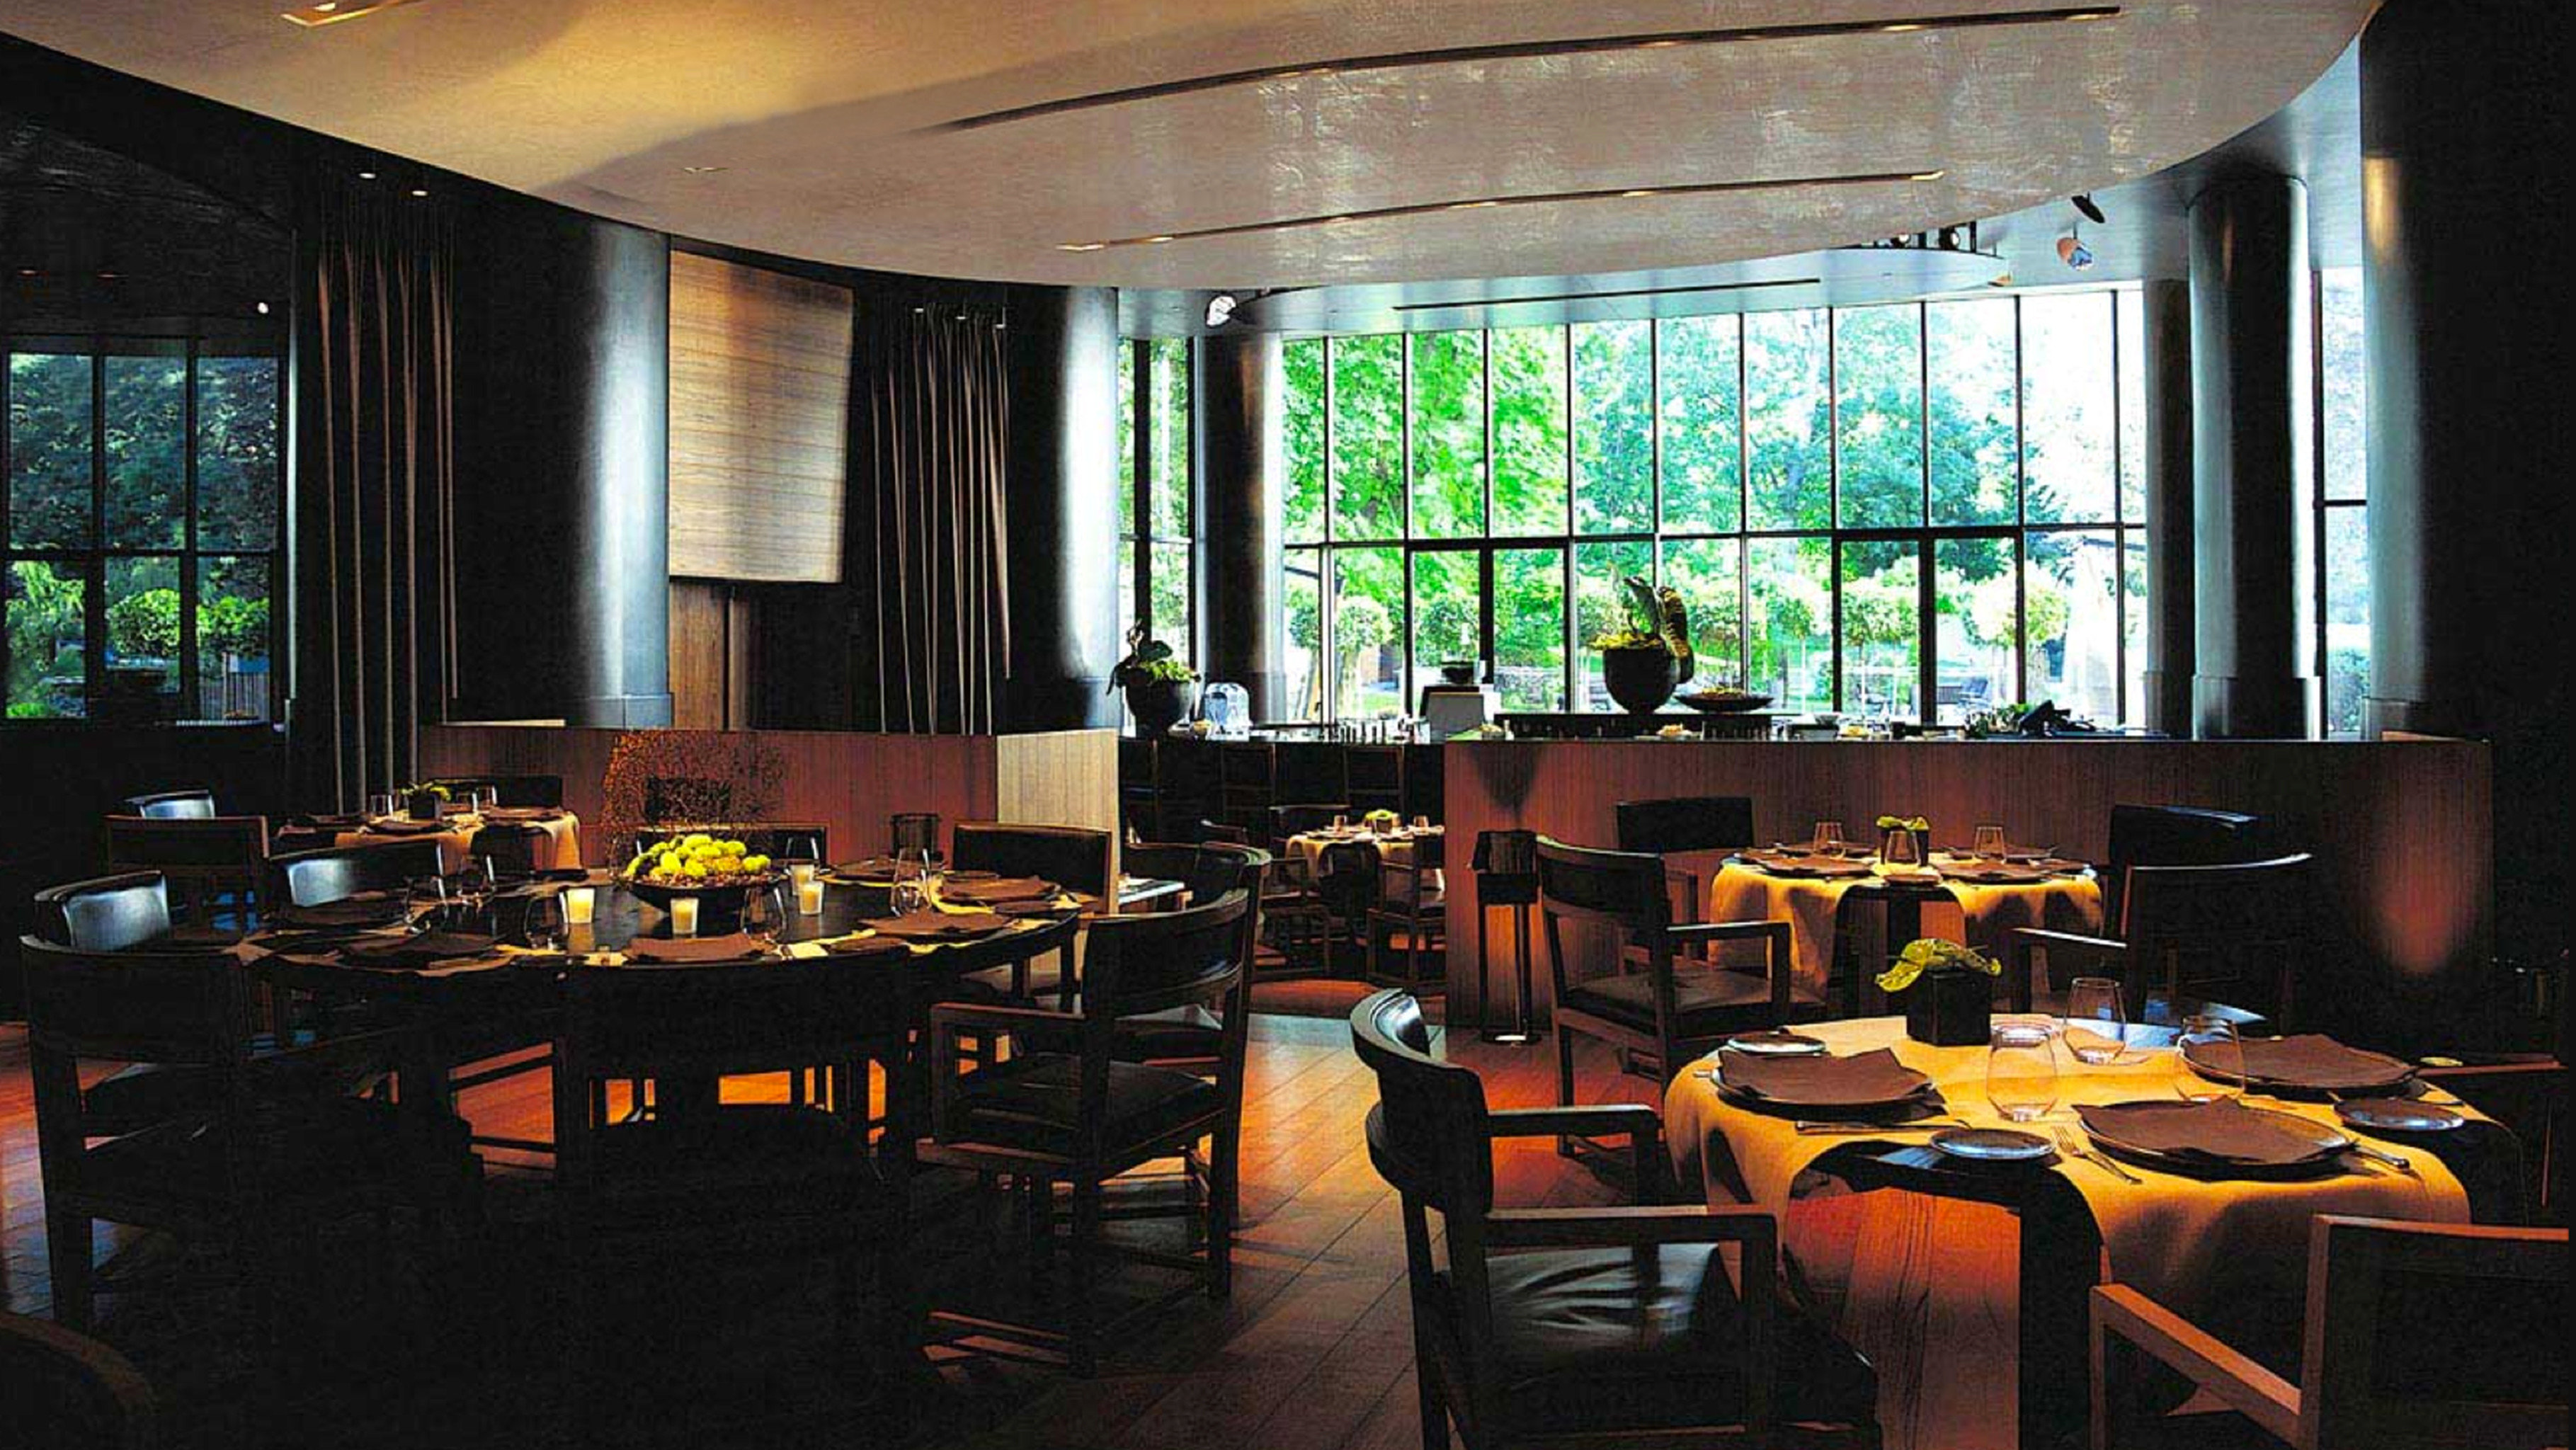 Dining Luxury Modern restaurant Bar function hall